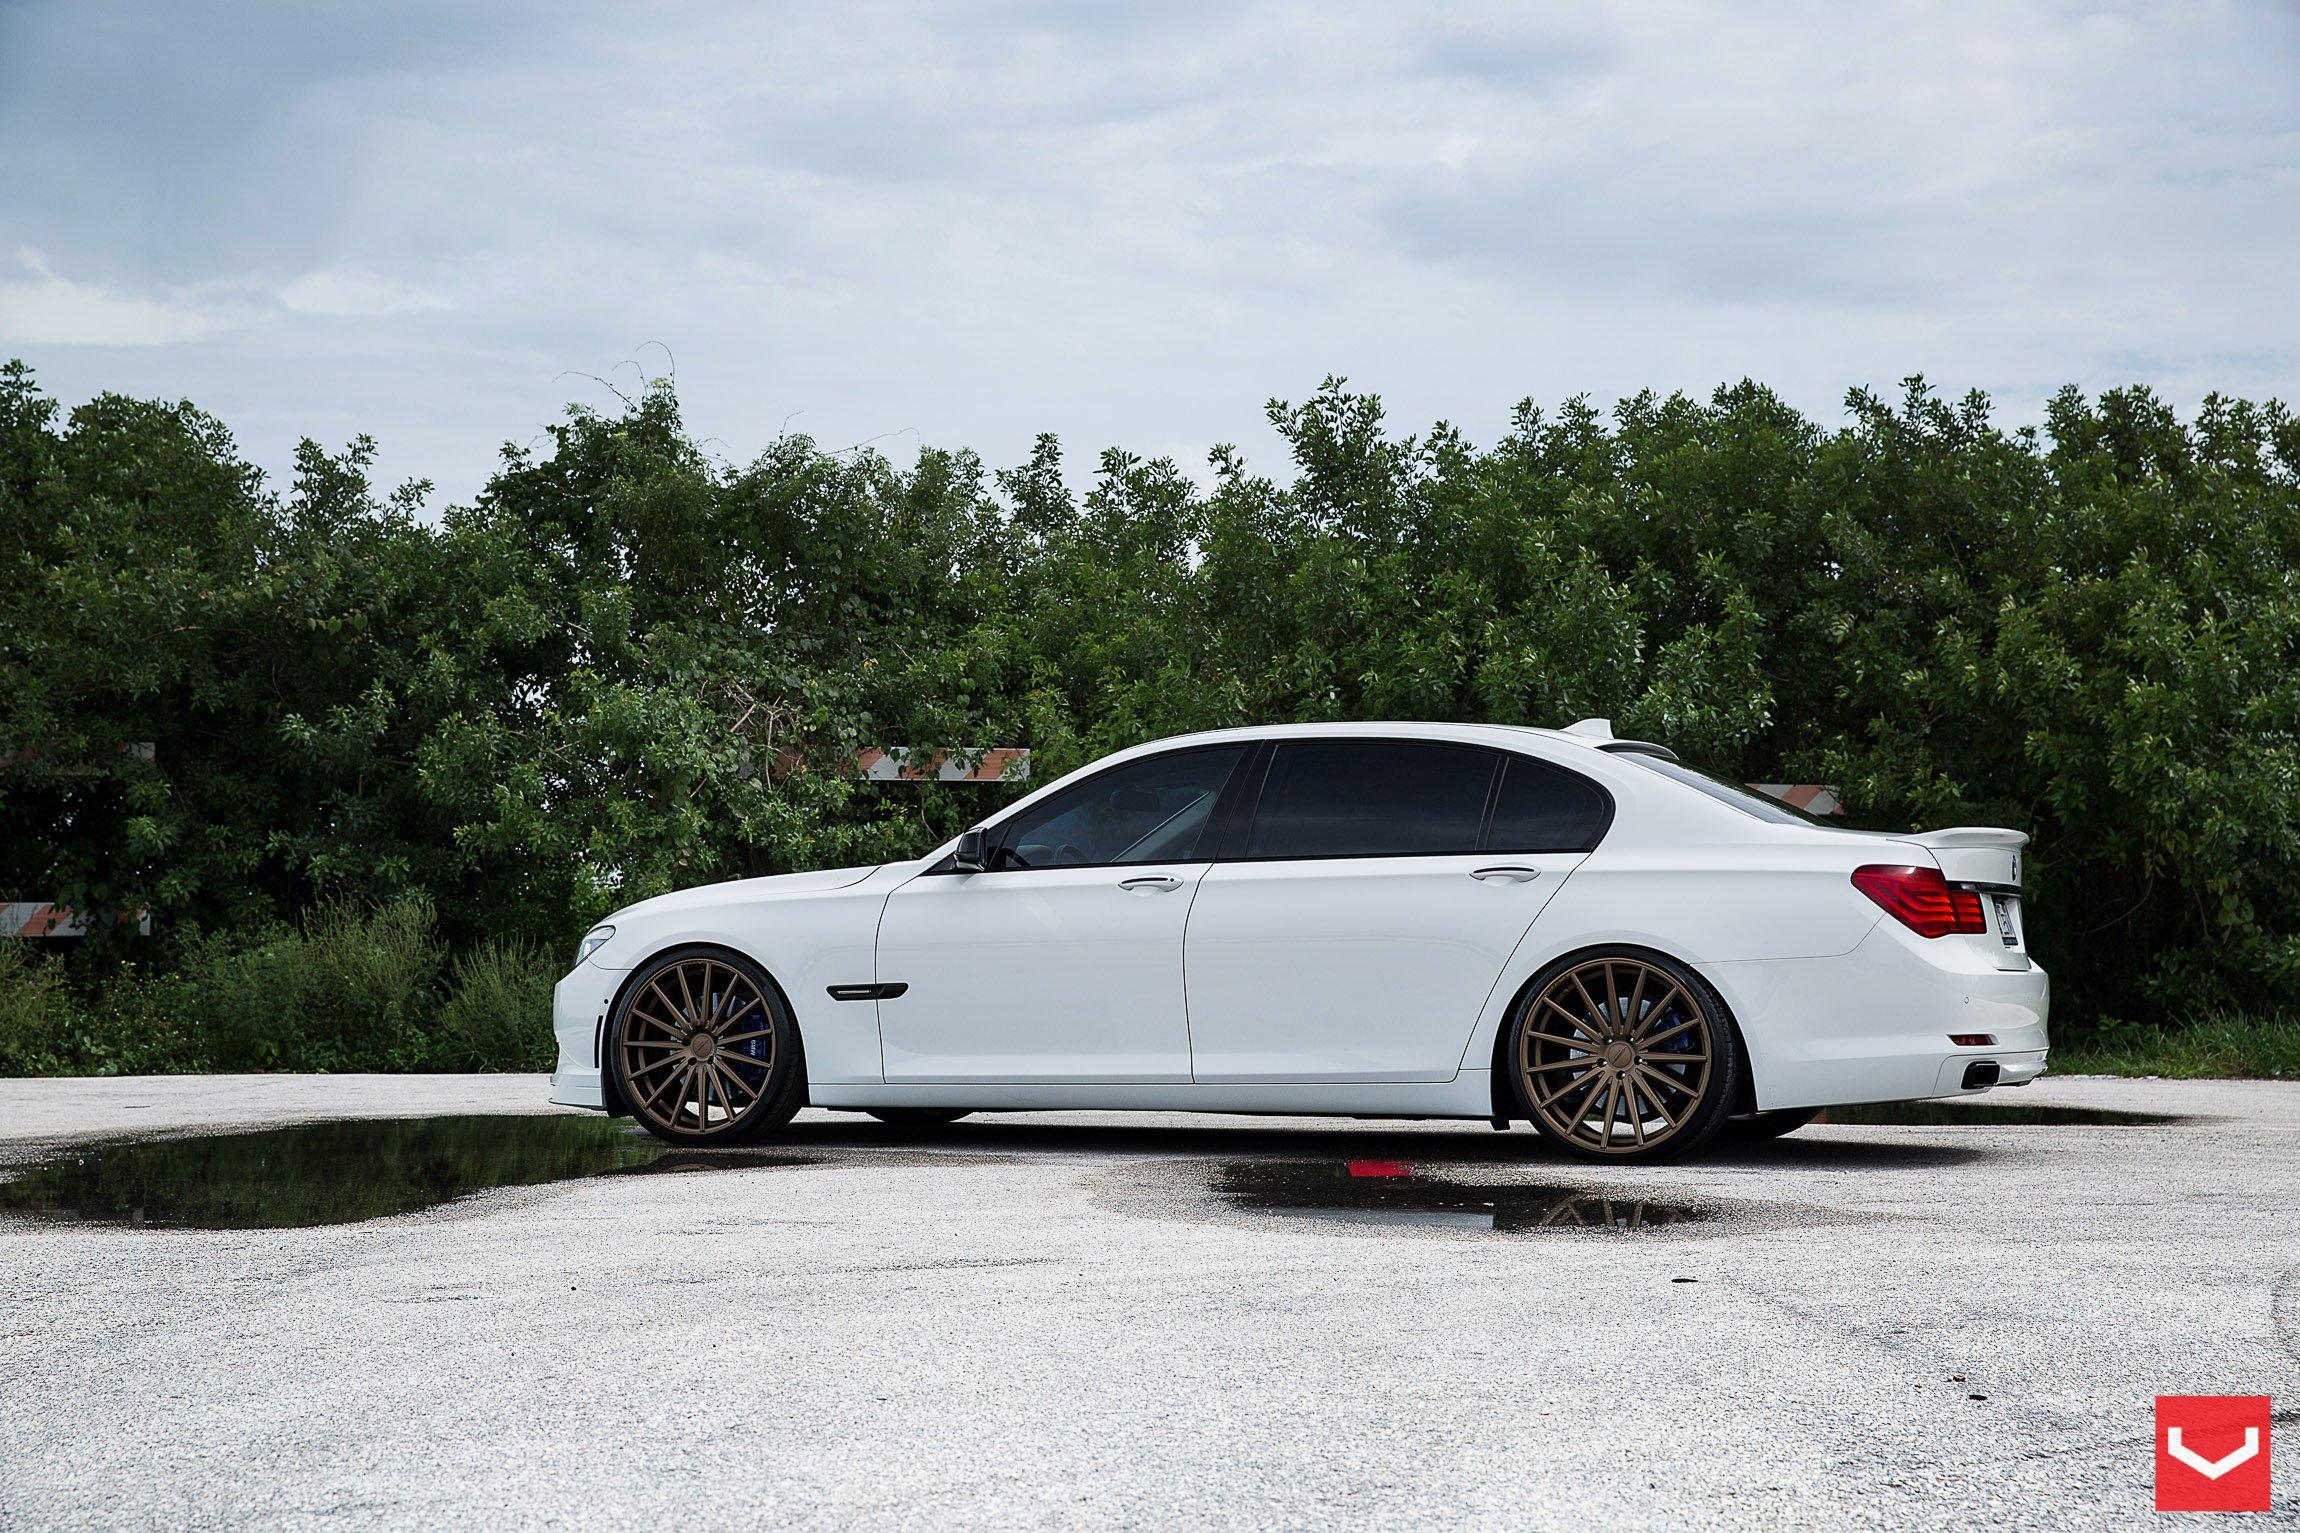 2014_vossen_BMW_7_Series_sedan_Tuning_wheels_cars_2300x1533.jpg